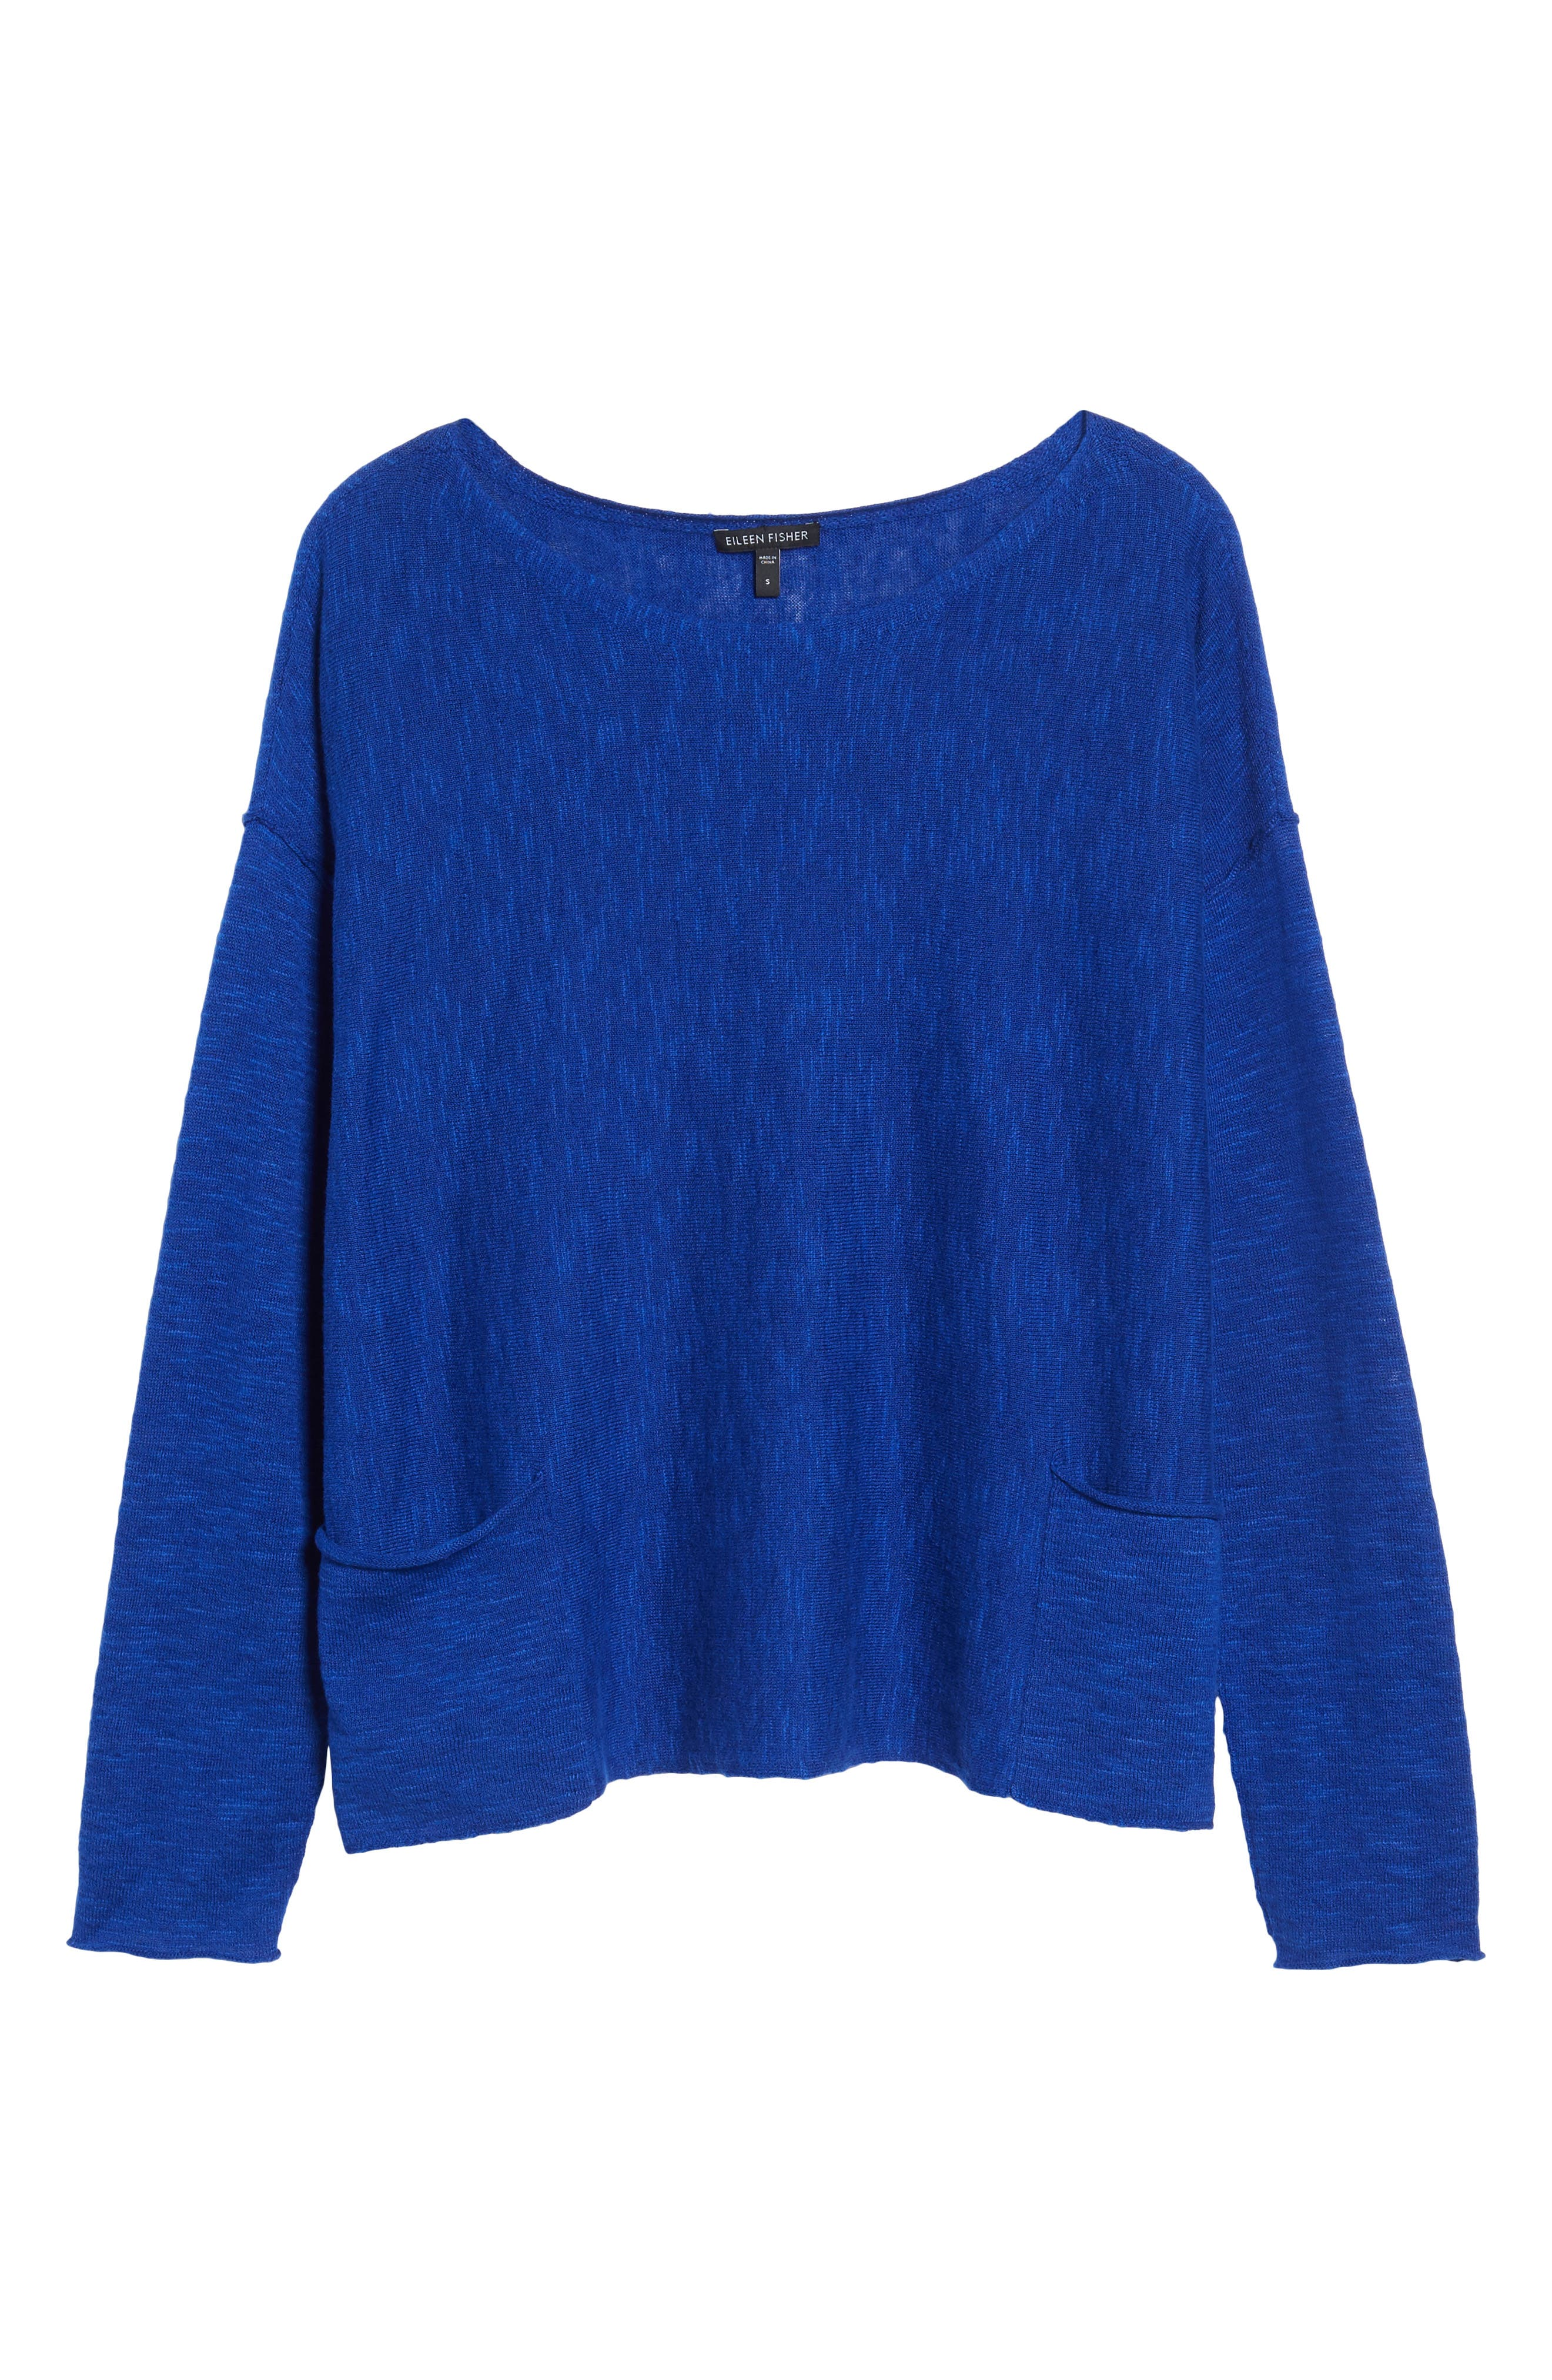 Organic Linen & Cotton Knit Boxy Top,                             Main thumbnail 1, color,                             Royal